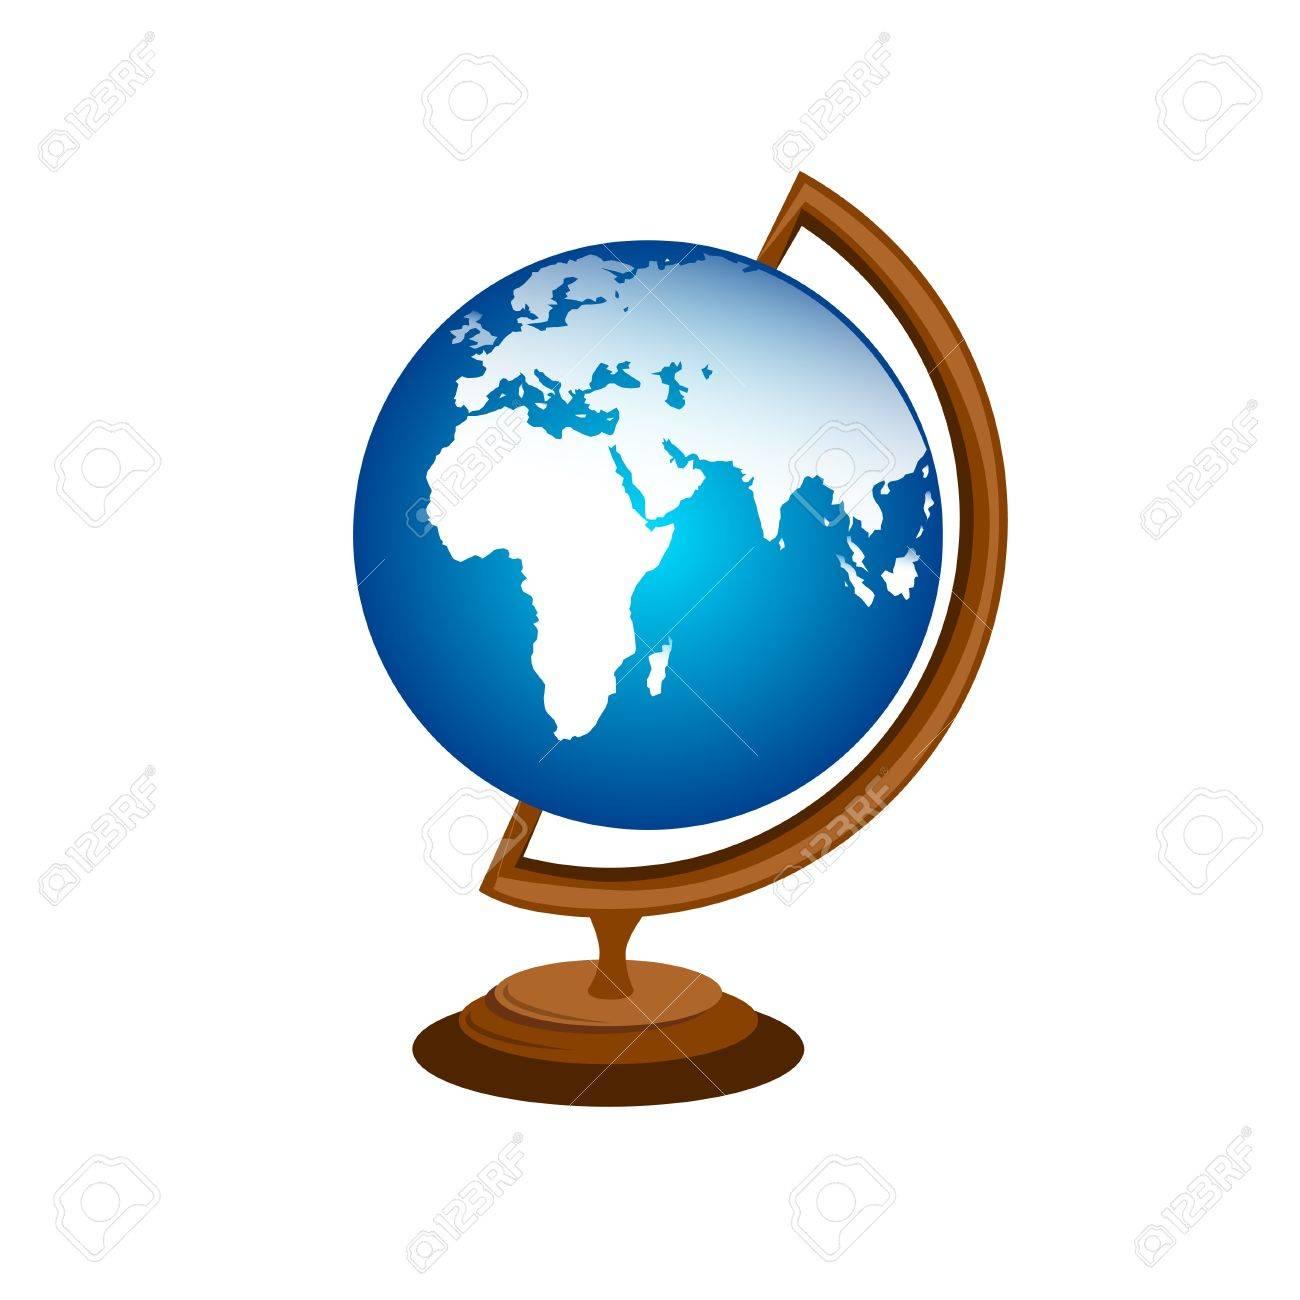 Table Globe Stock Vector - 11020010